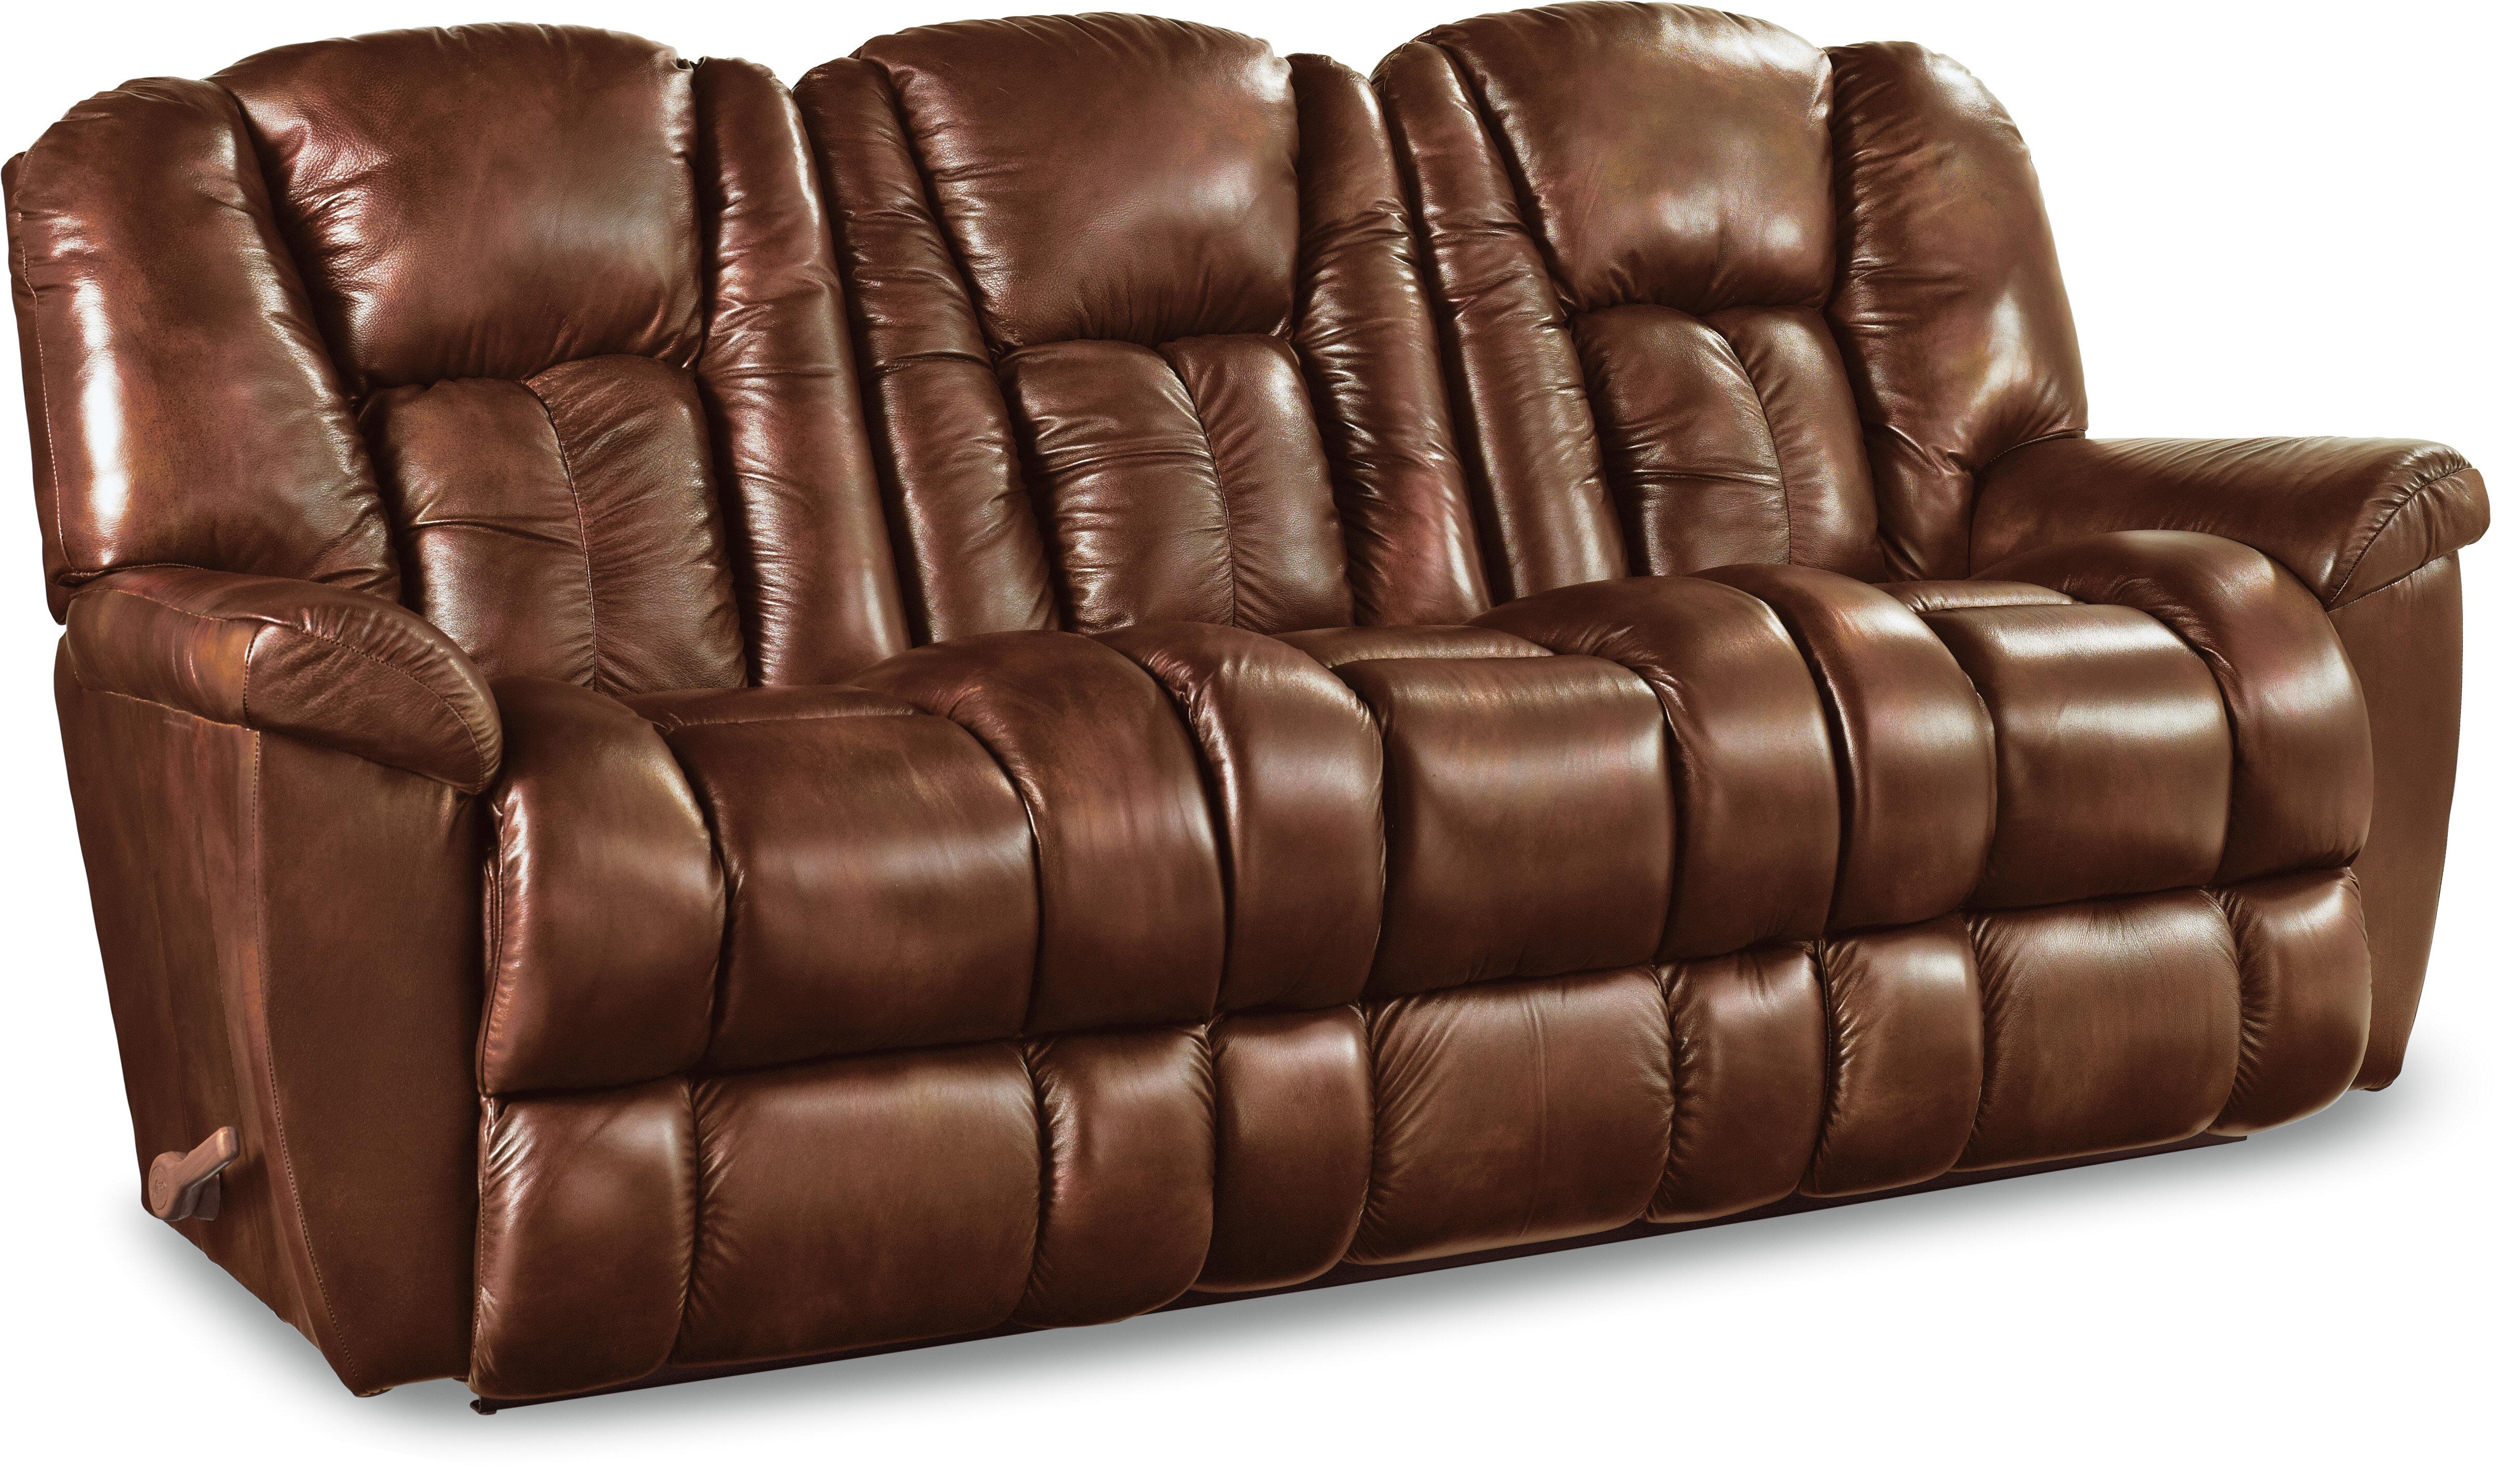 Leather Reclining Sofa Black Bonded Leather Reclining Sofa